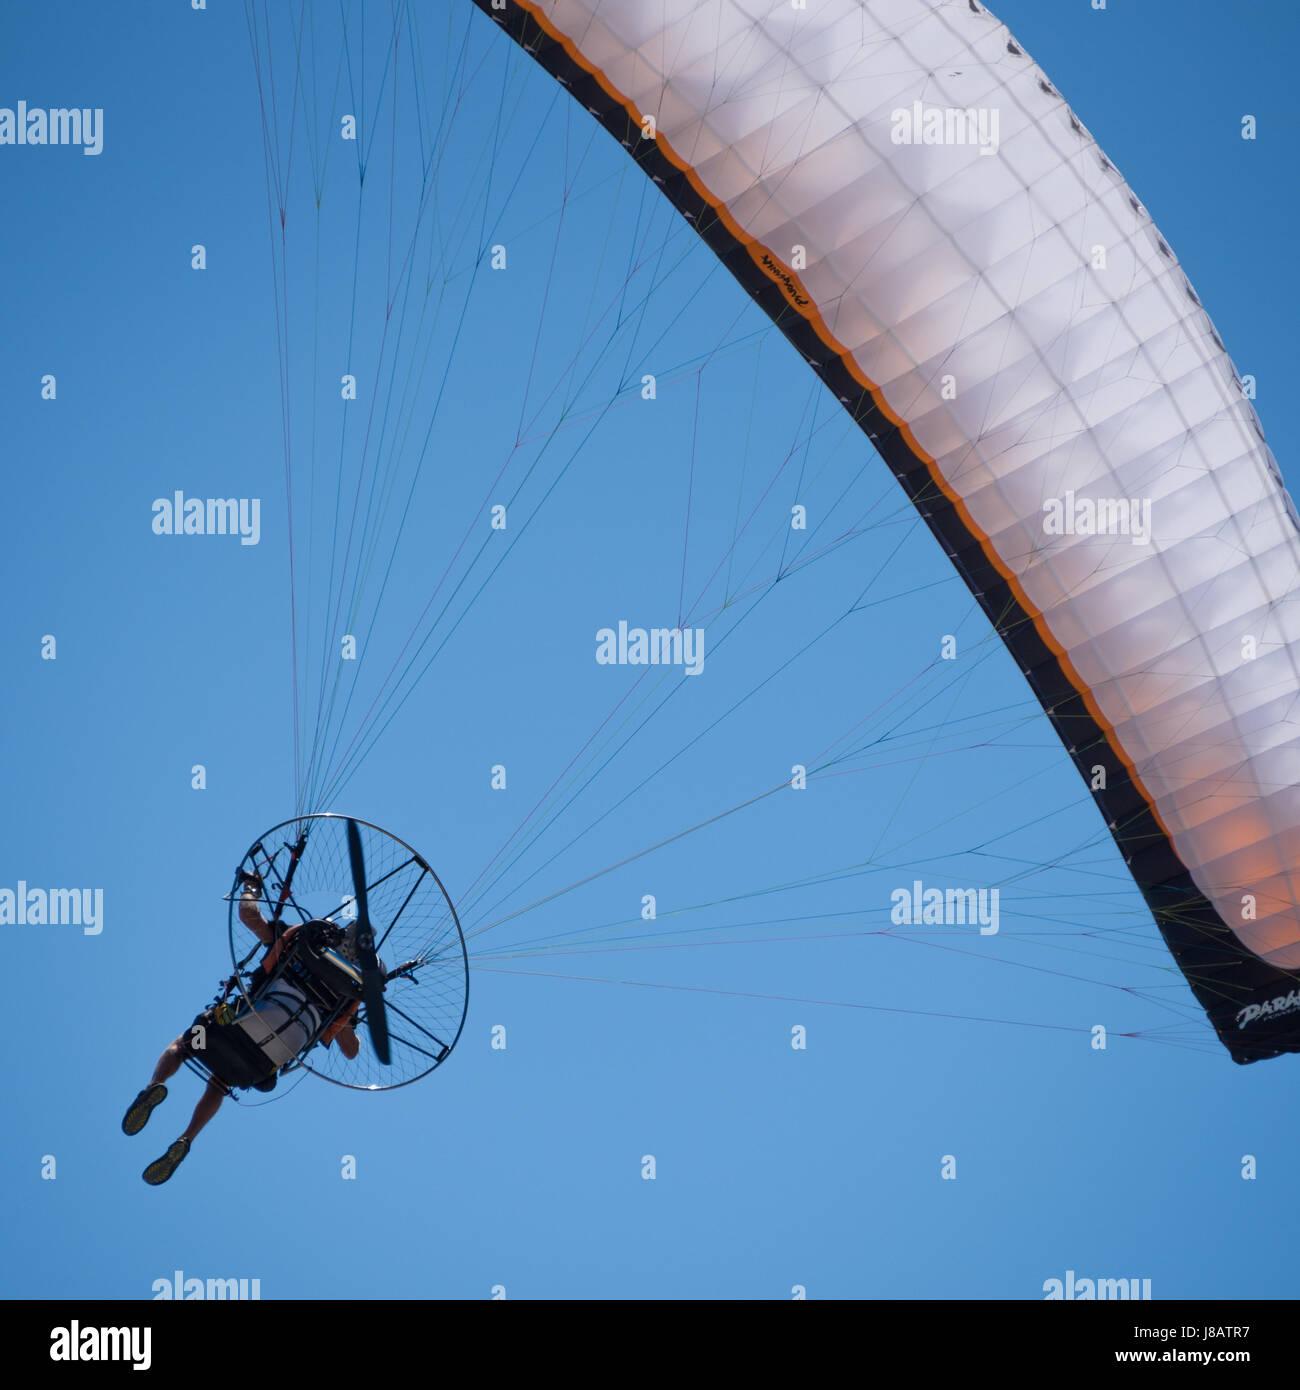 Paramotoring Stock Photos & Paramotoring Stock Images - Alamy